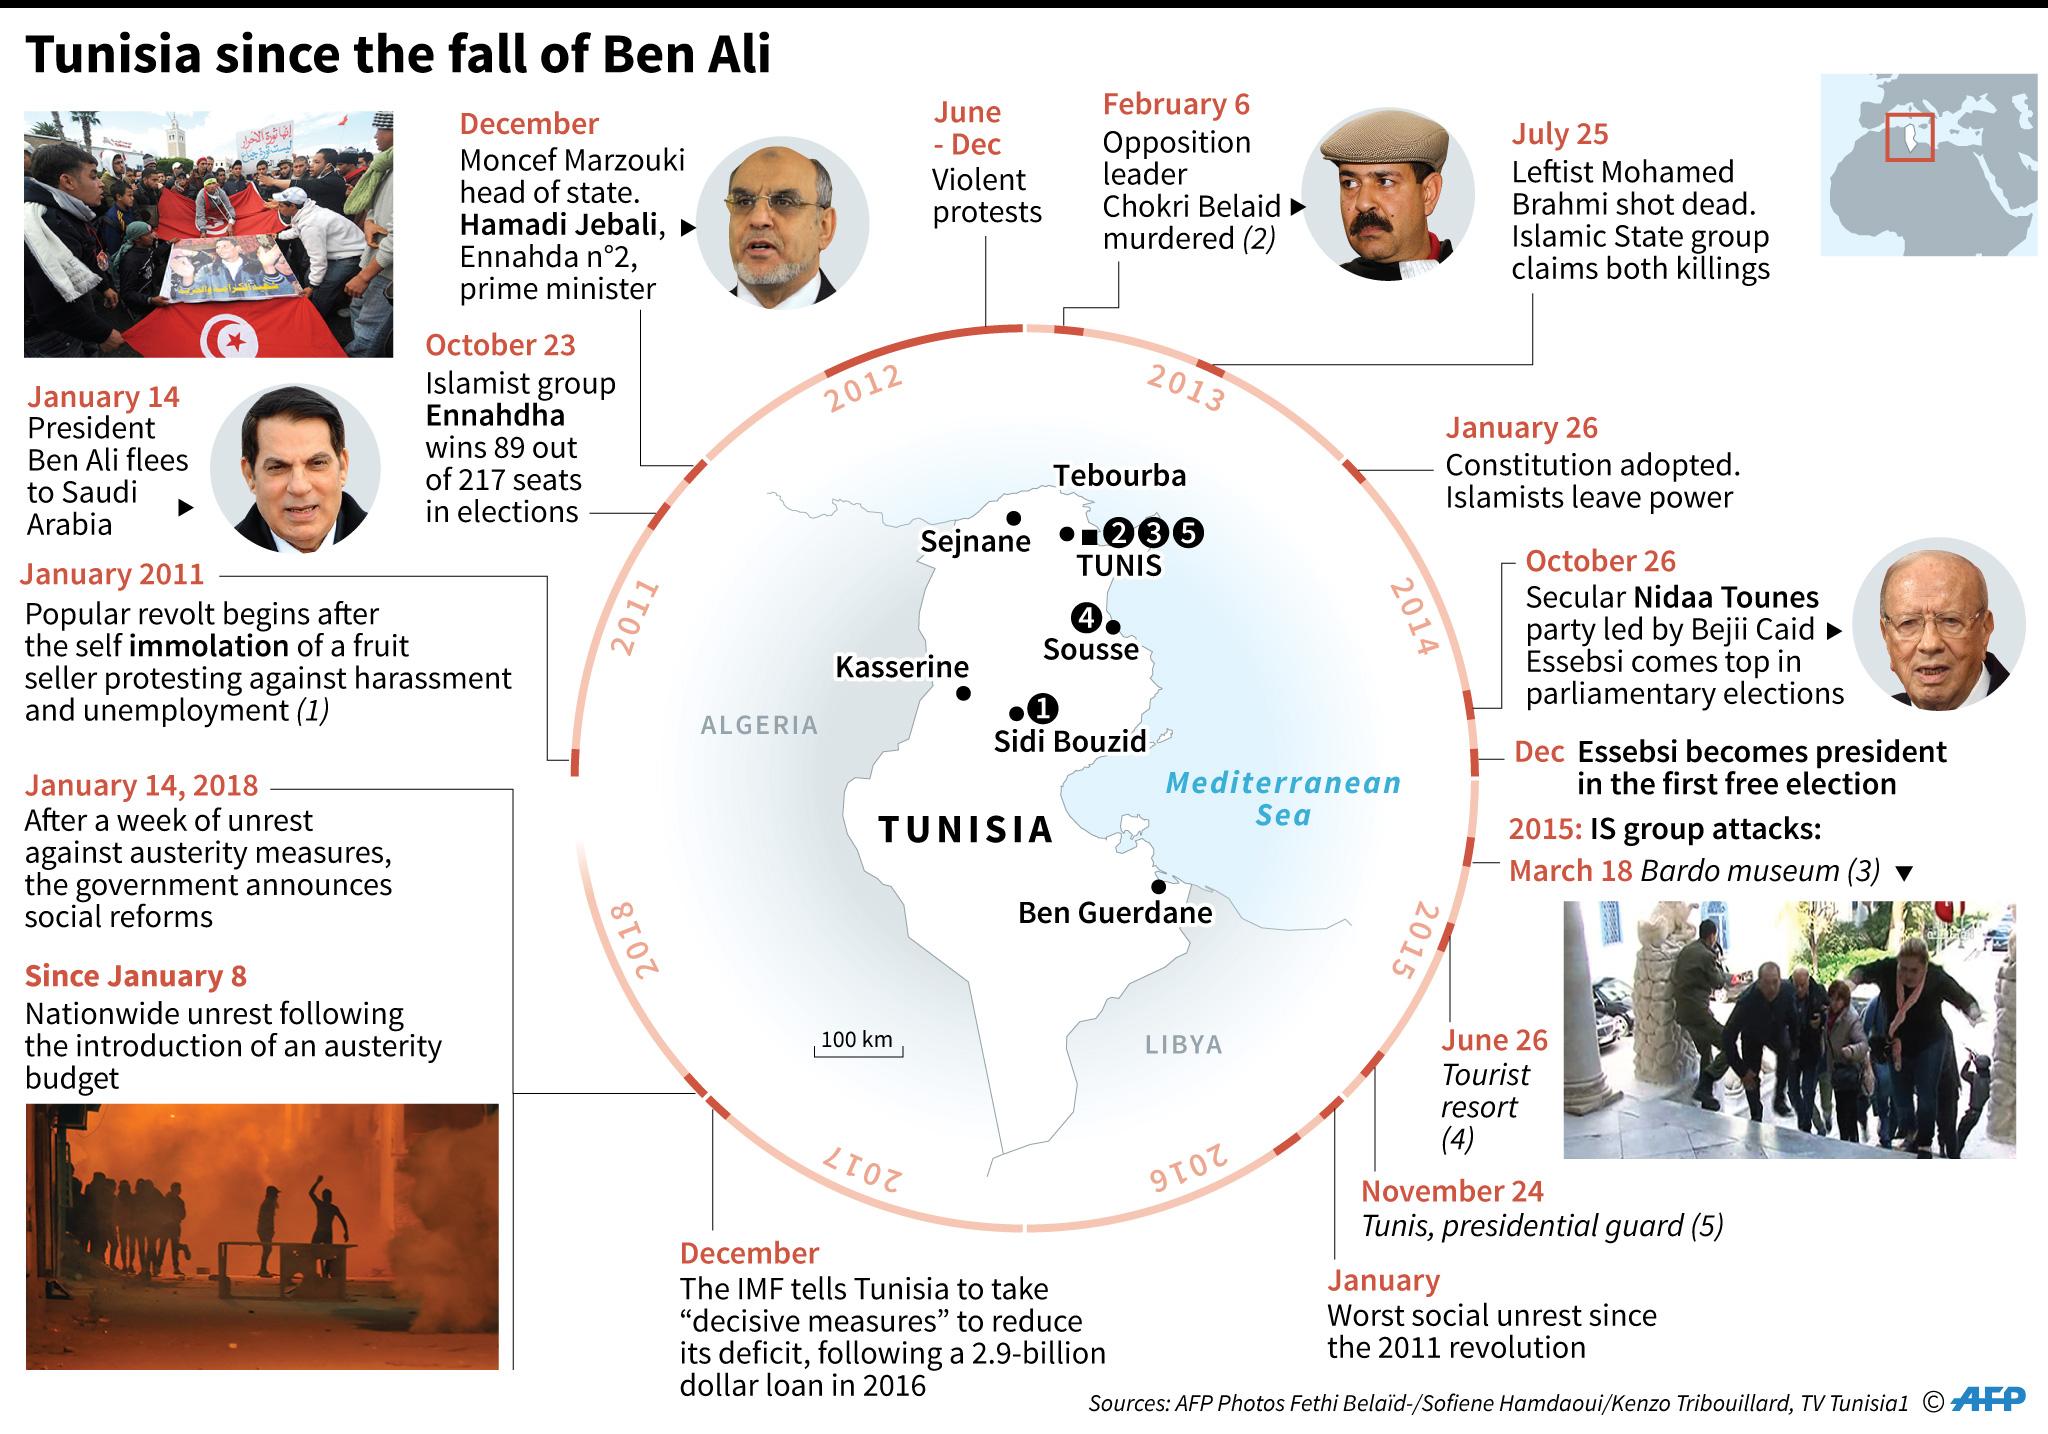 tunisia ben ali timeline unrest